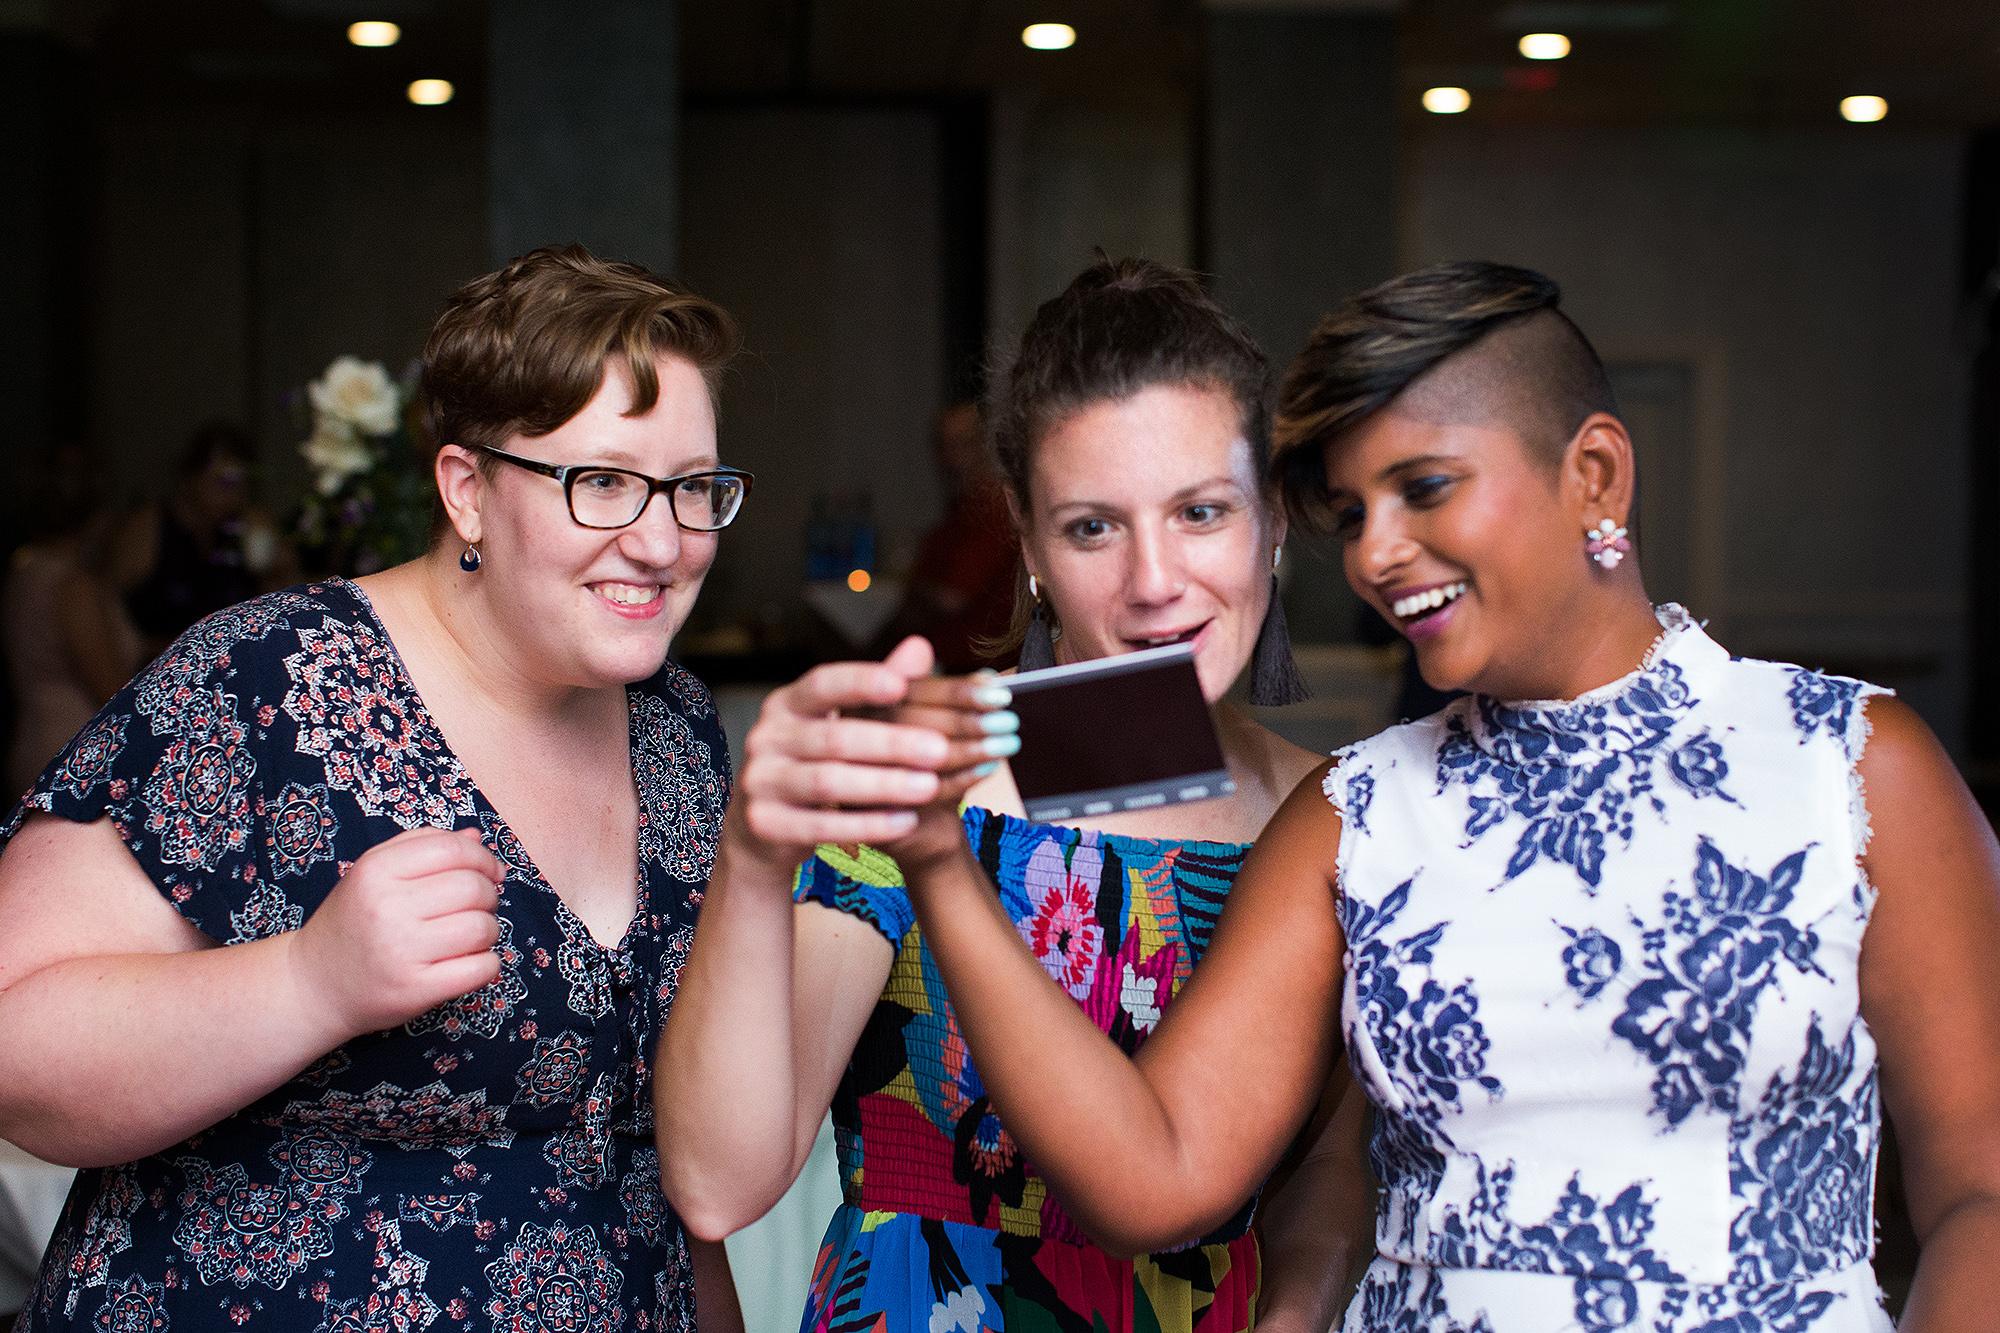 3-wedding-reception-guests-sarah-corbett-photography-polaroids.jpg